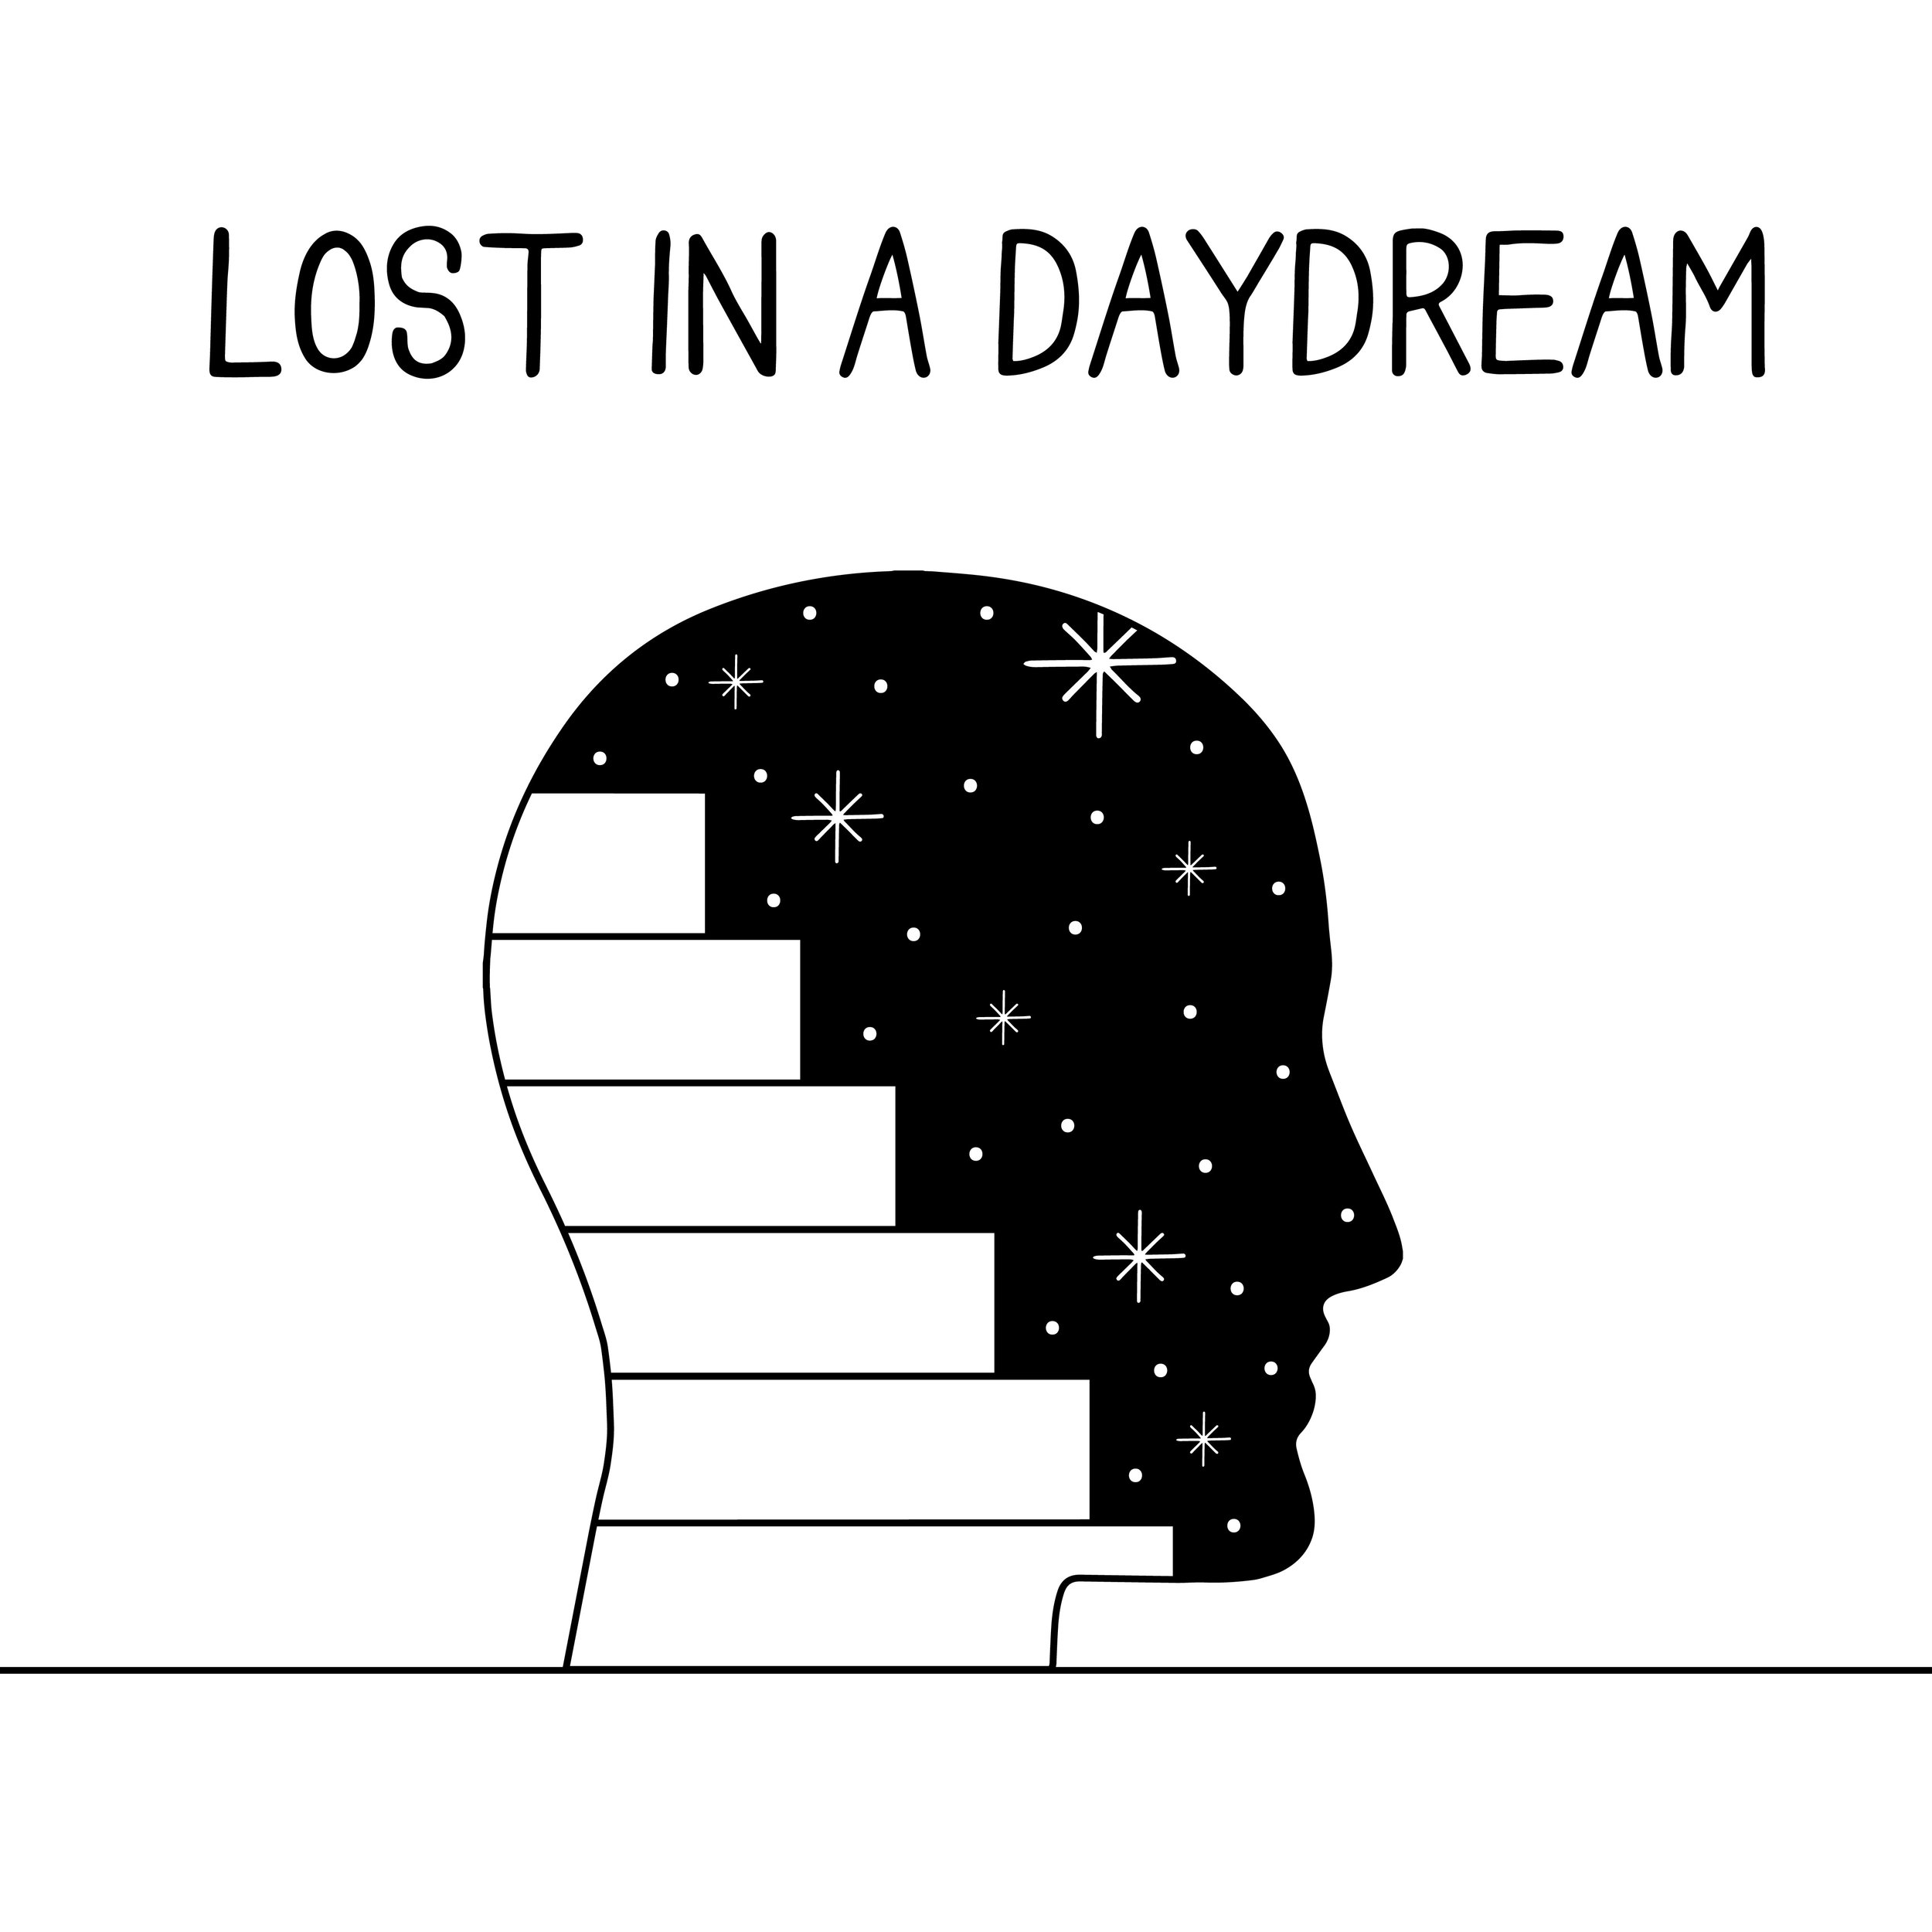 daydream-01.jpg